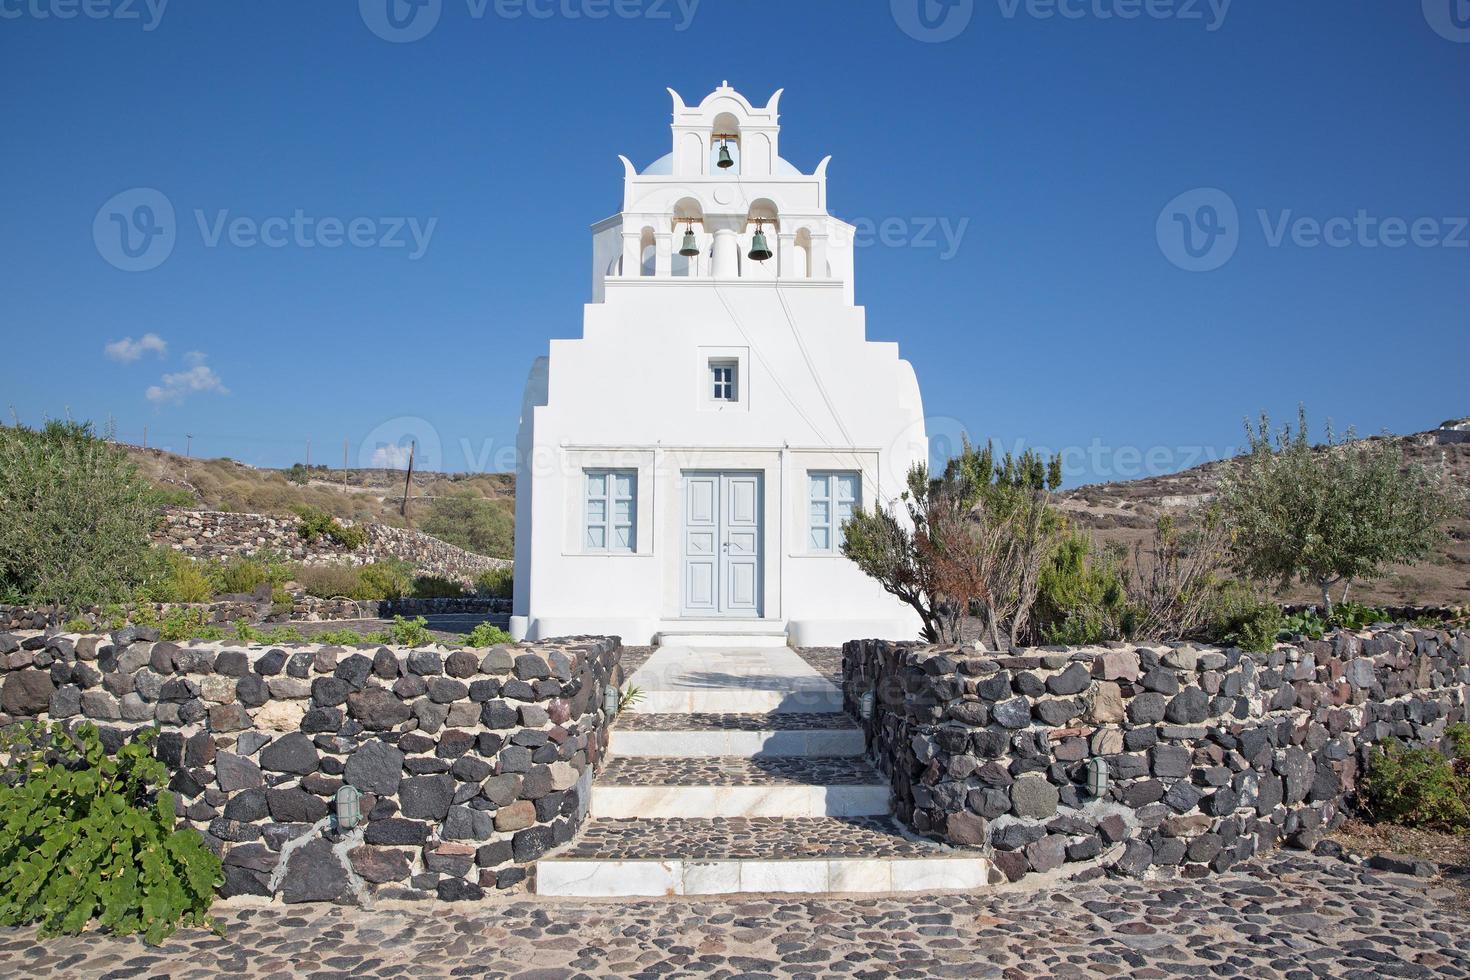 santorini - pequena capela ao longo da costa sul da ilha. foto